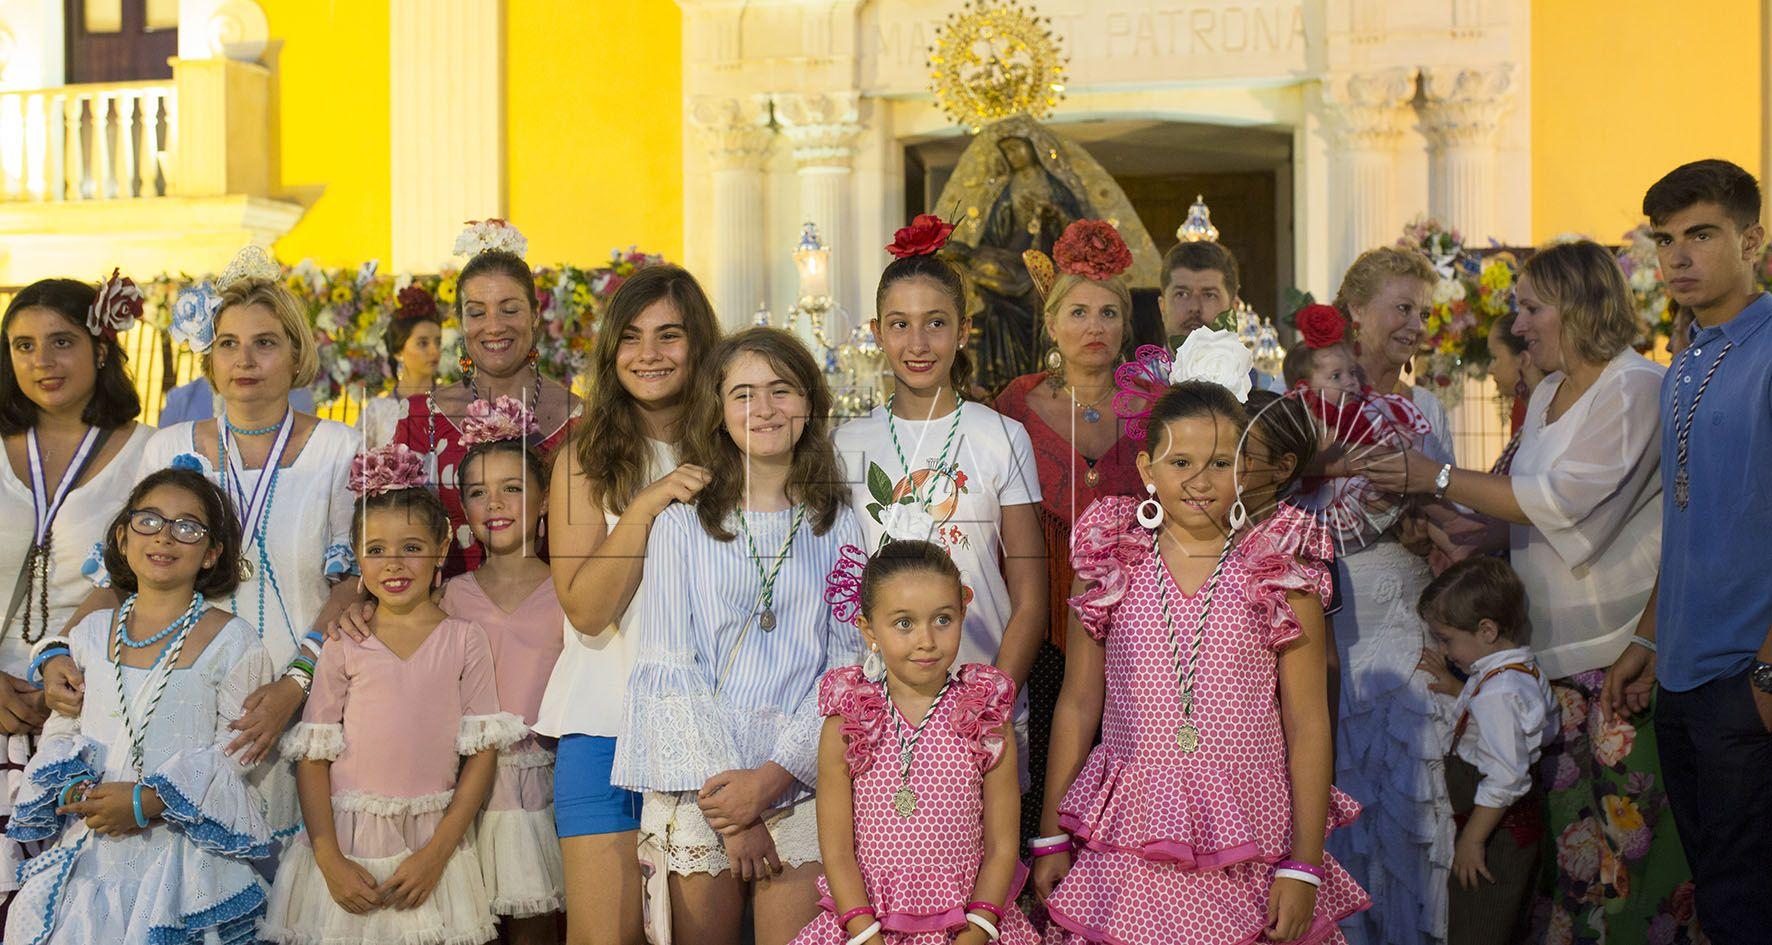 La patrona recibi la devoci n de sus fieles en forma de for Educacion exterior marruecos